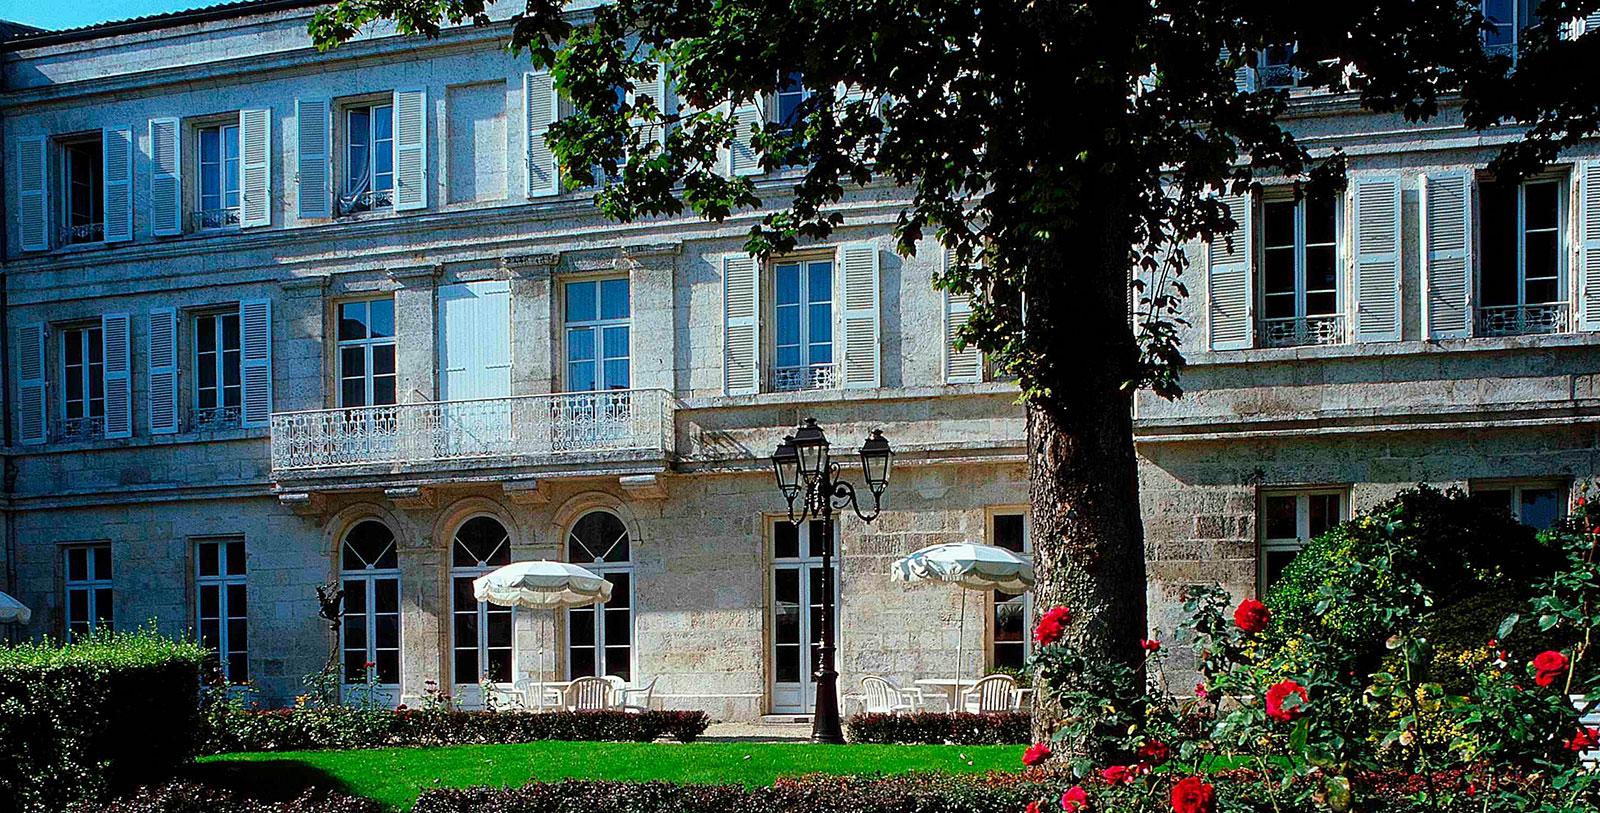 Image of Hotel Exterior, Mercure Angouleme Hotel de France, established 1600, member of Historic Hotels Worldwide 2019, France, Europe, Overview